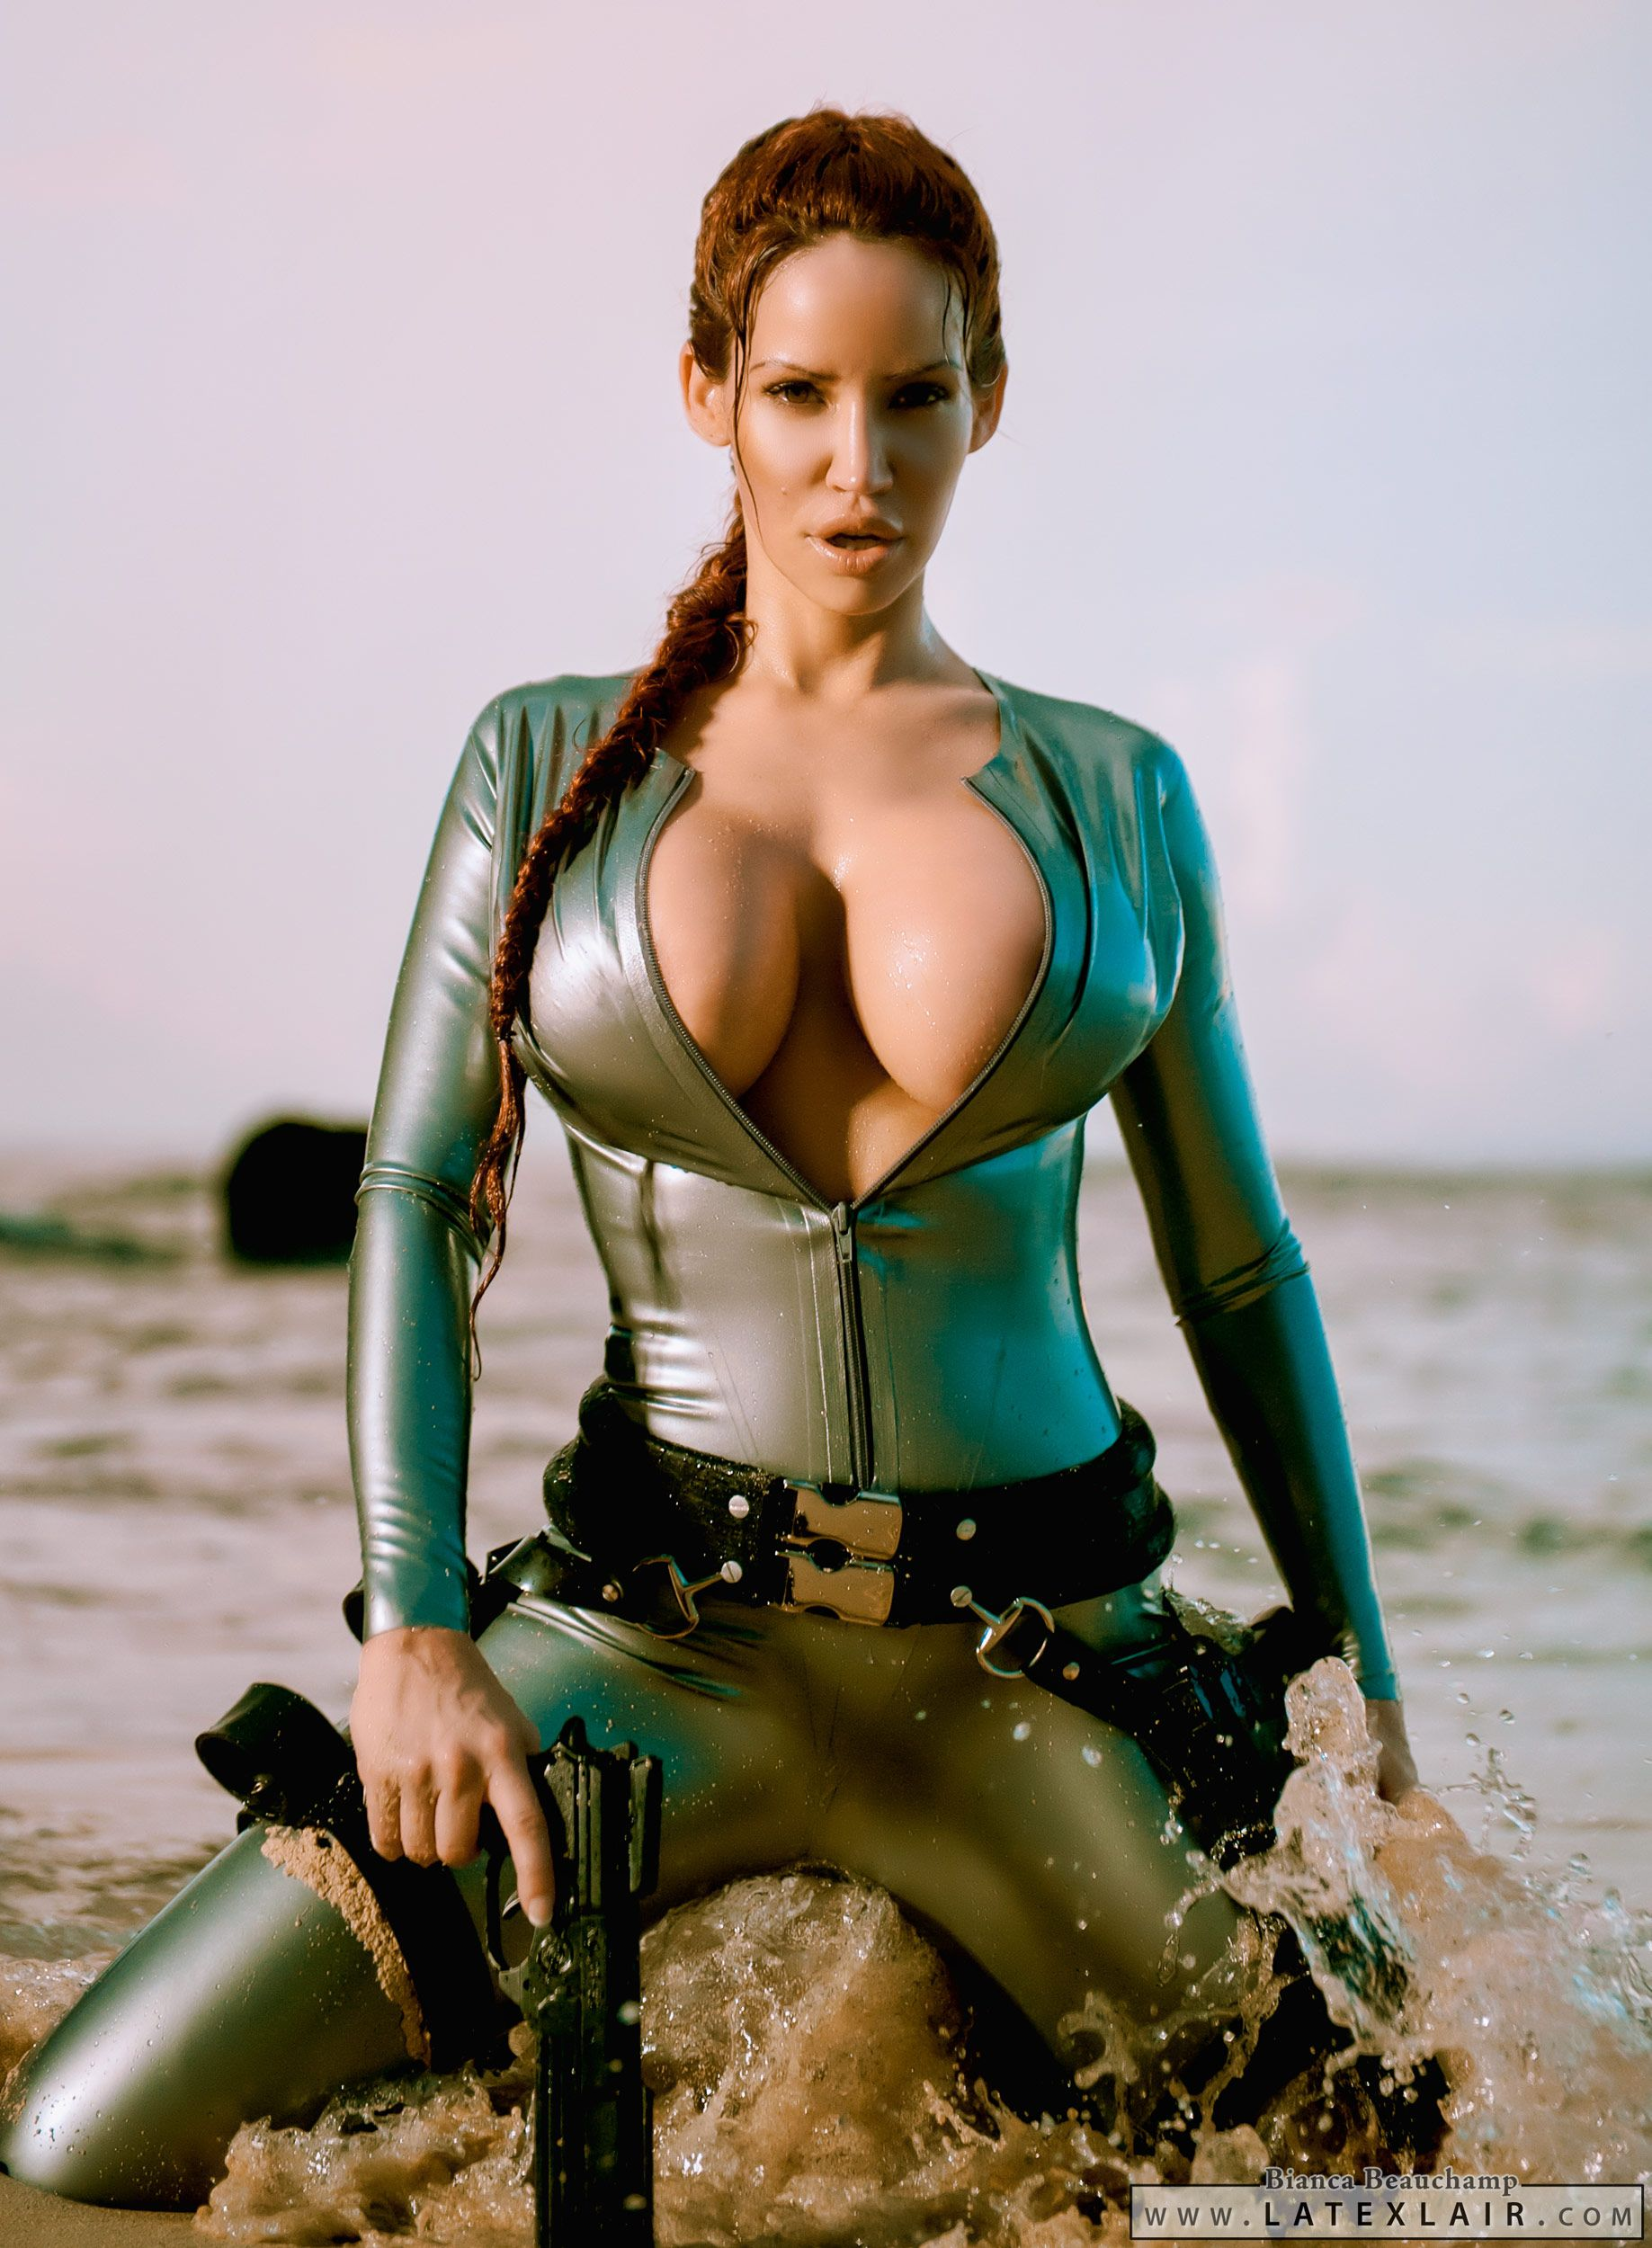 Celebrites Bianca Beauchamp nudes (74 pics), Ass